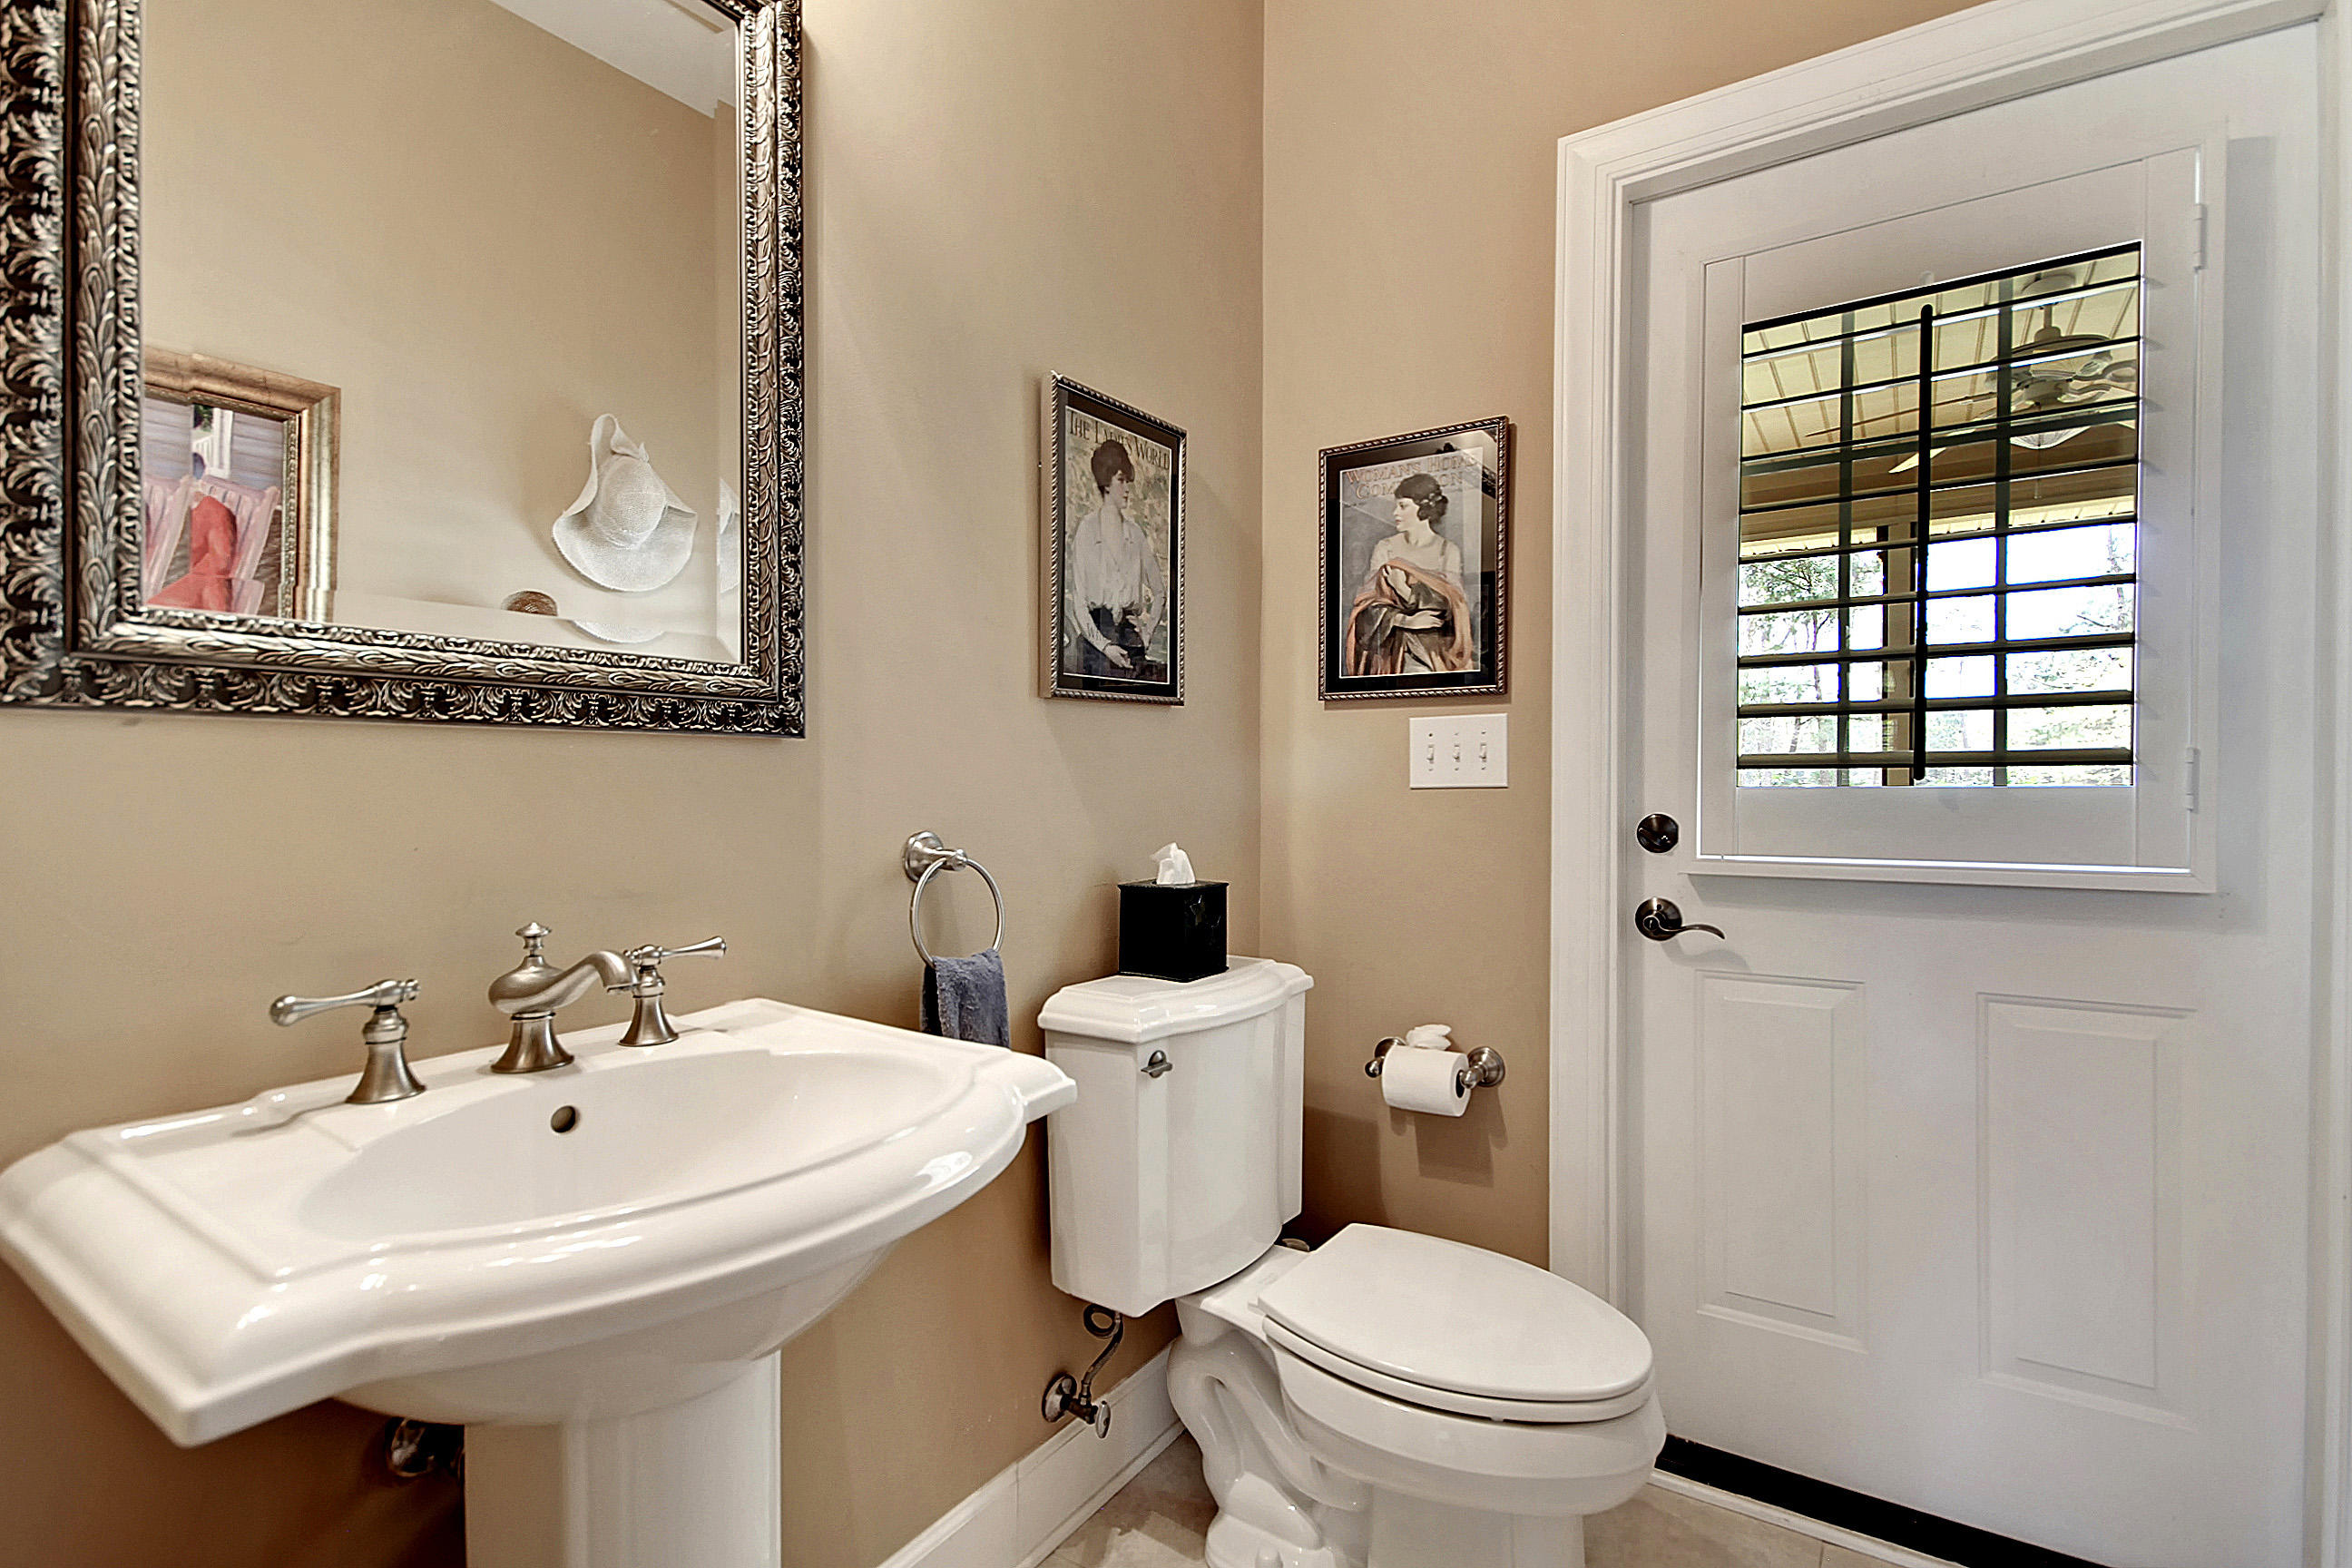 Dunes West Homes For Sale - 4002 Colonel Vanderhorst, Mount Pleasant, SC - 9